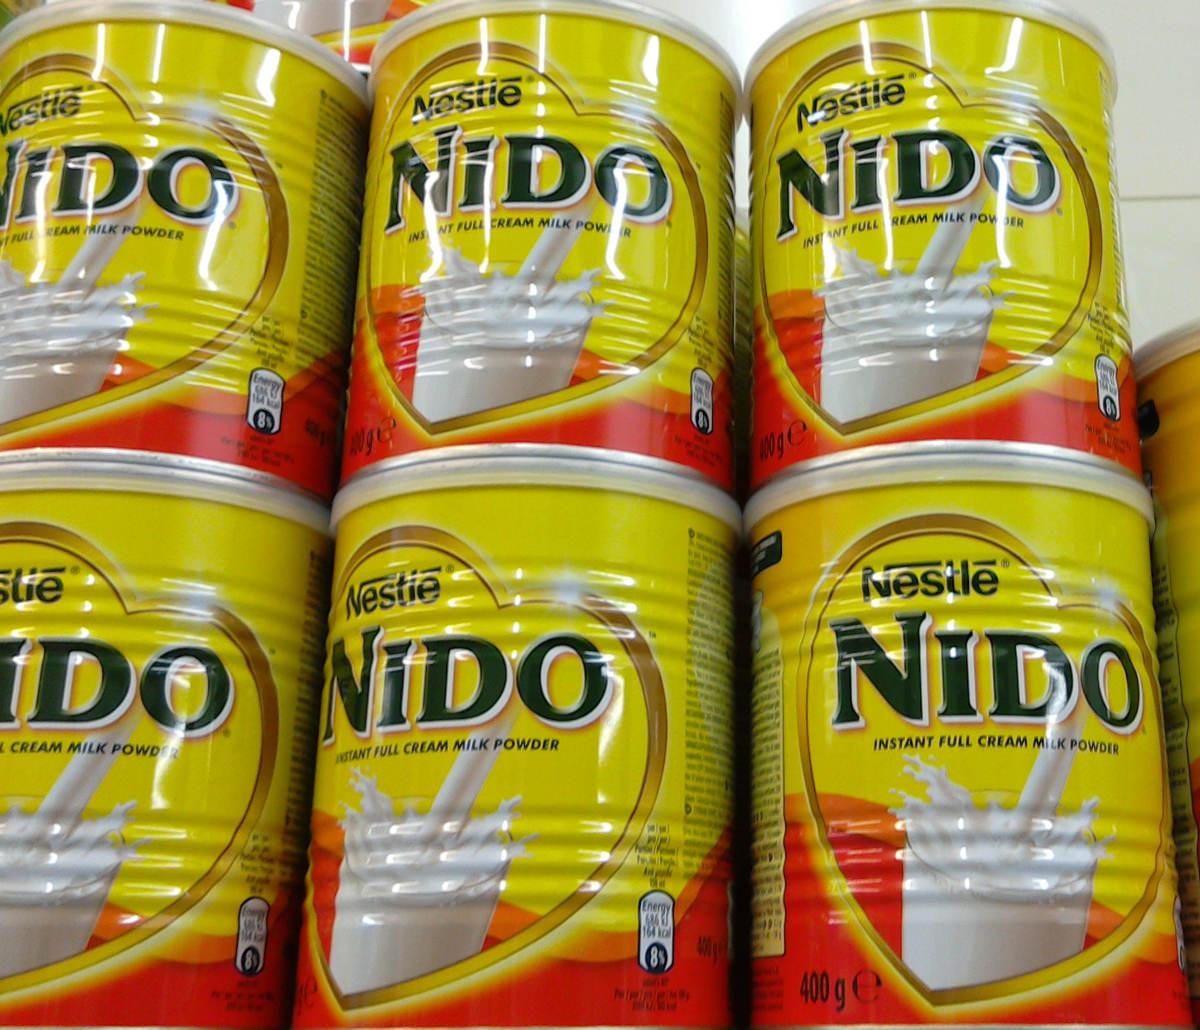 Nextle Nido Milk Powder